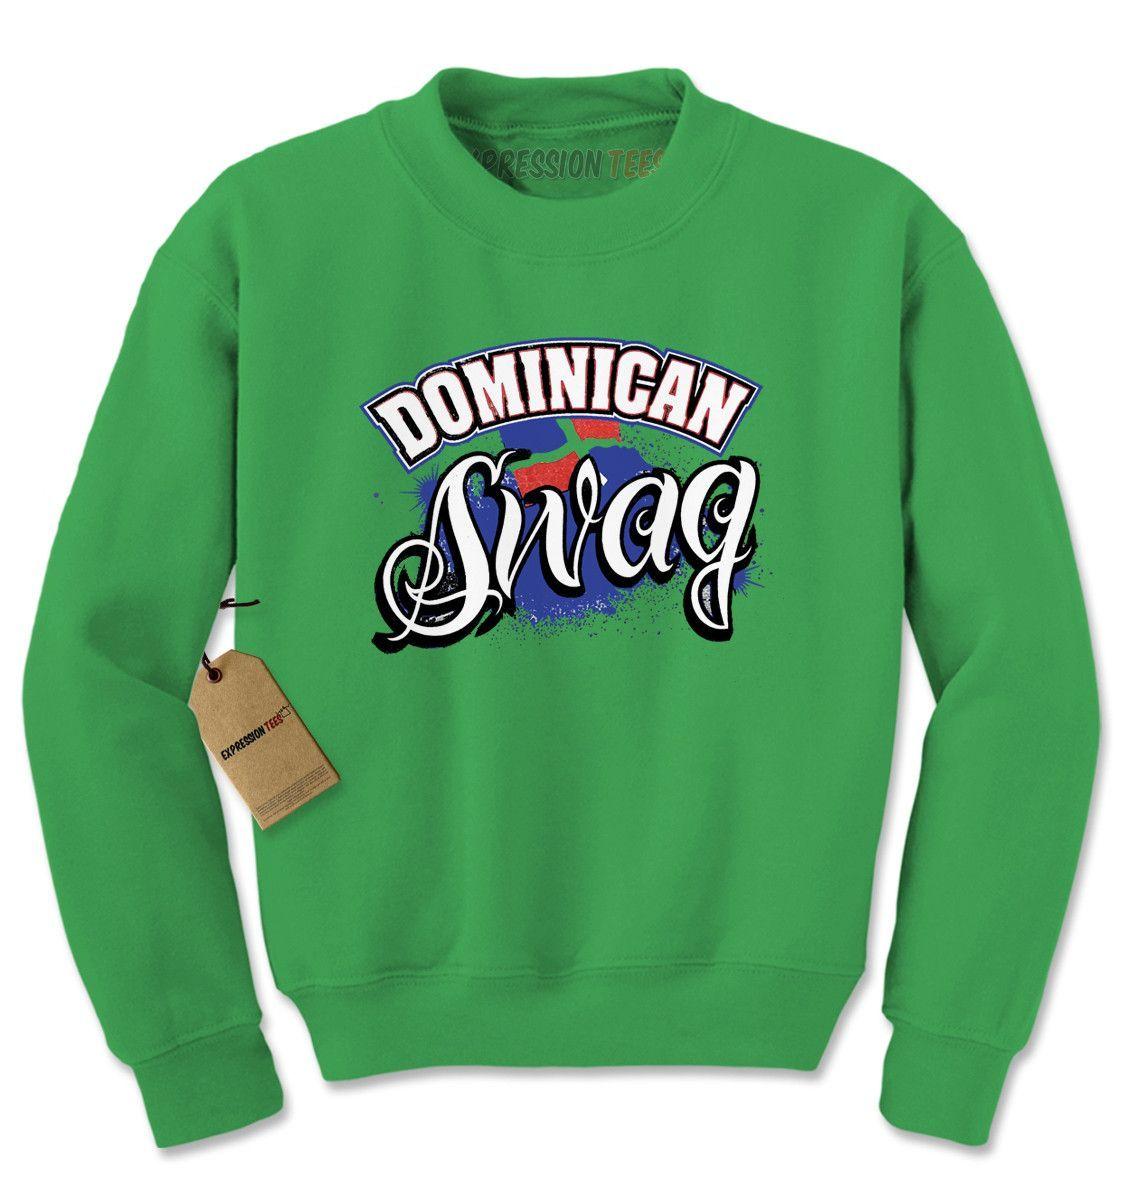 421242c655ac Dominican Swag Adult Crewneck Sweatshirt